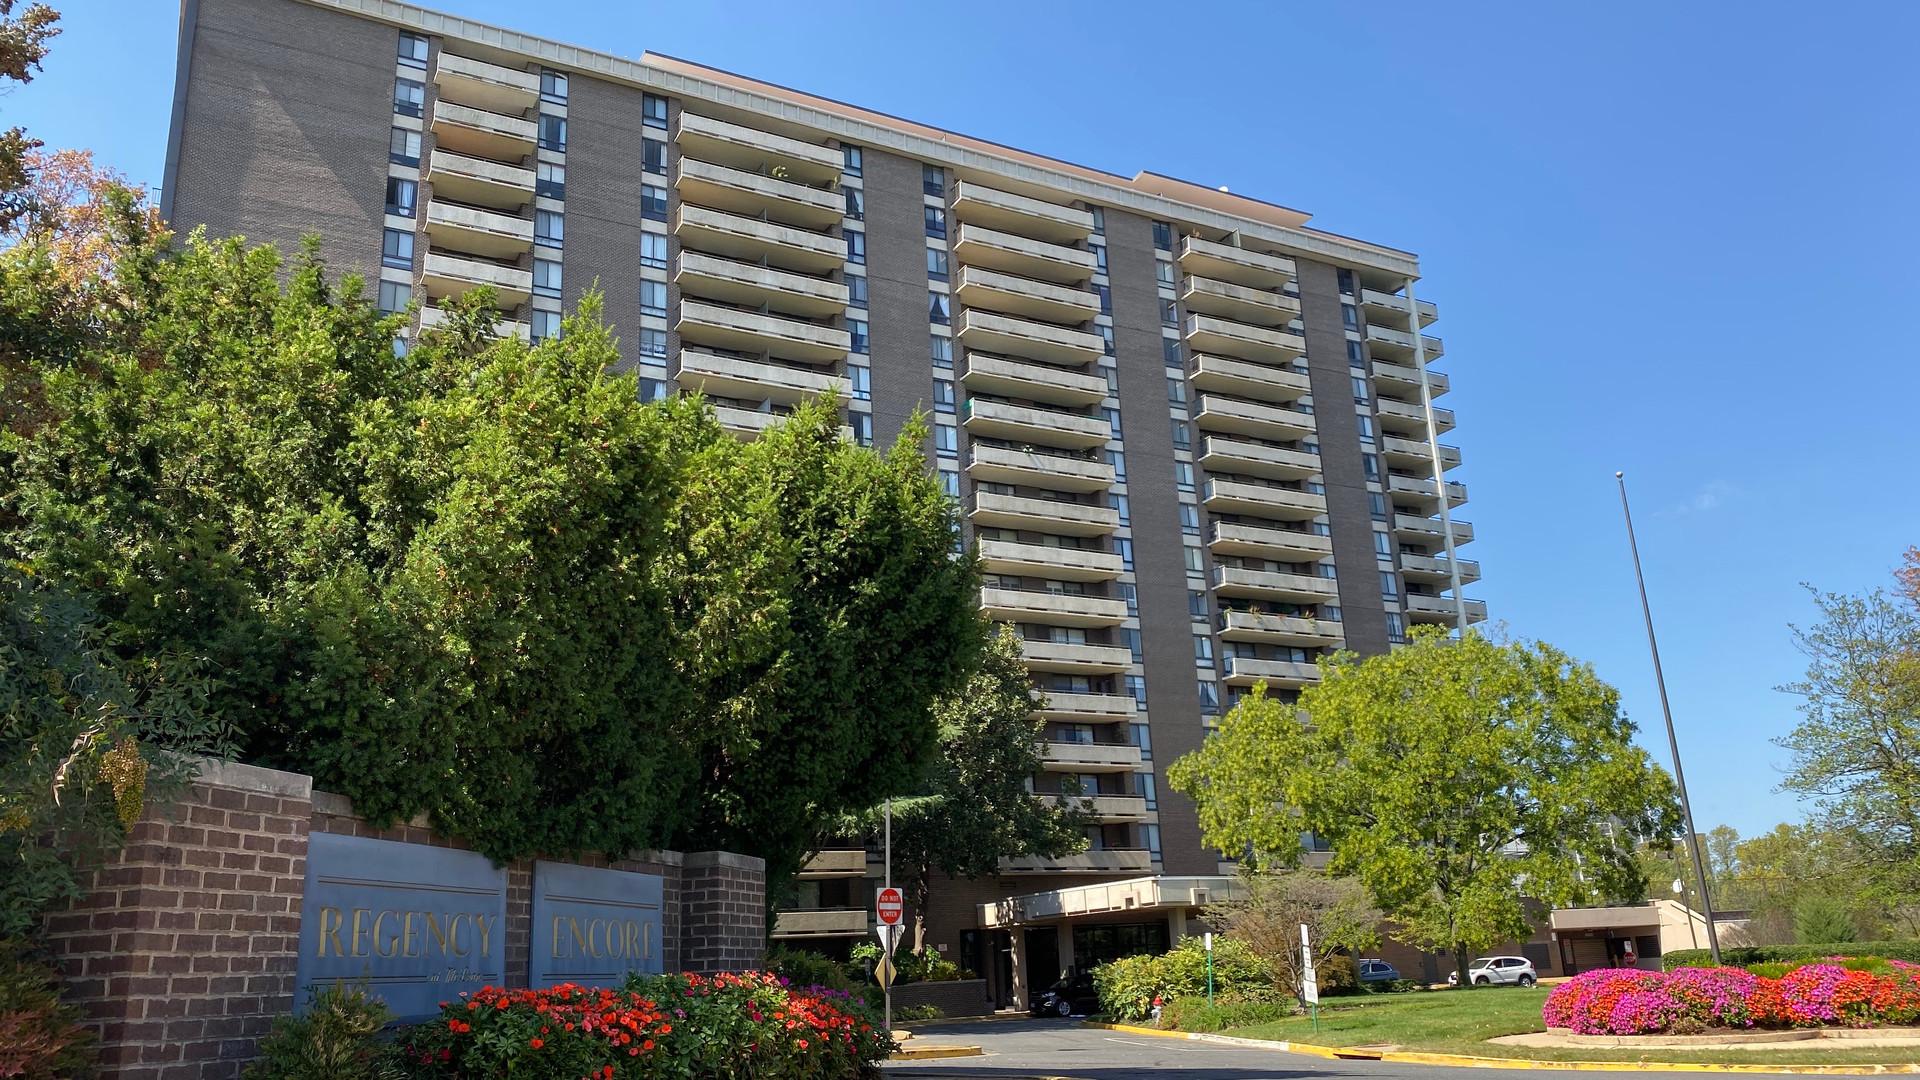 Replacement windows for condominiums